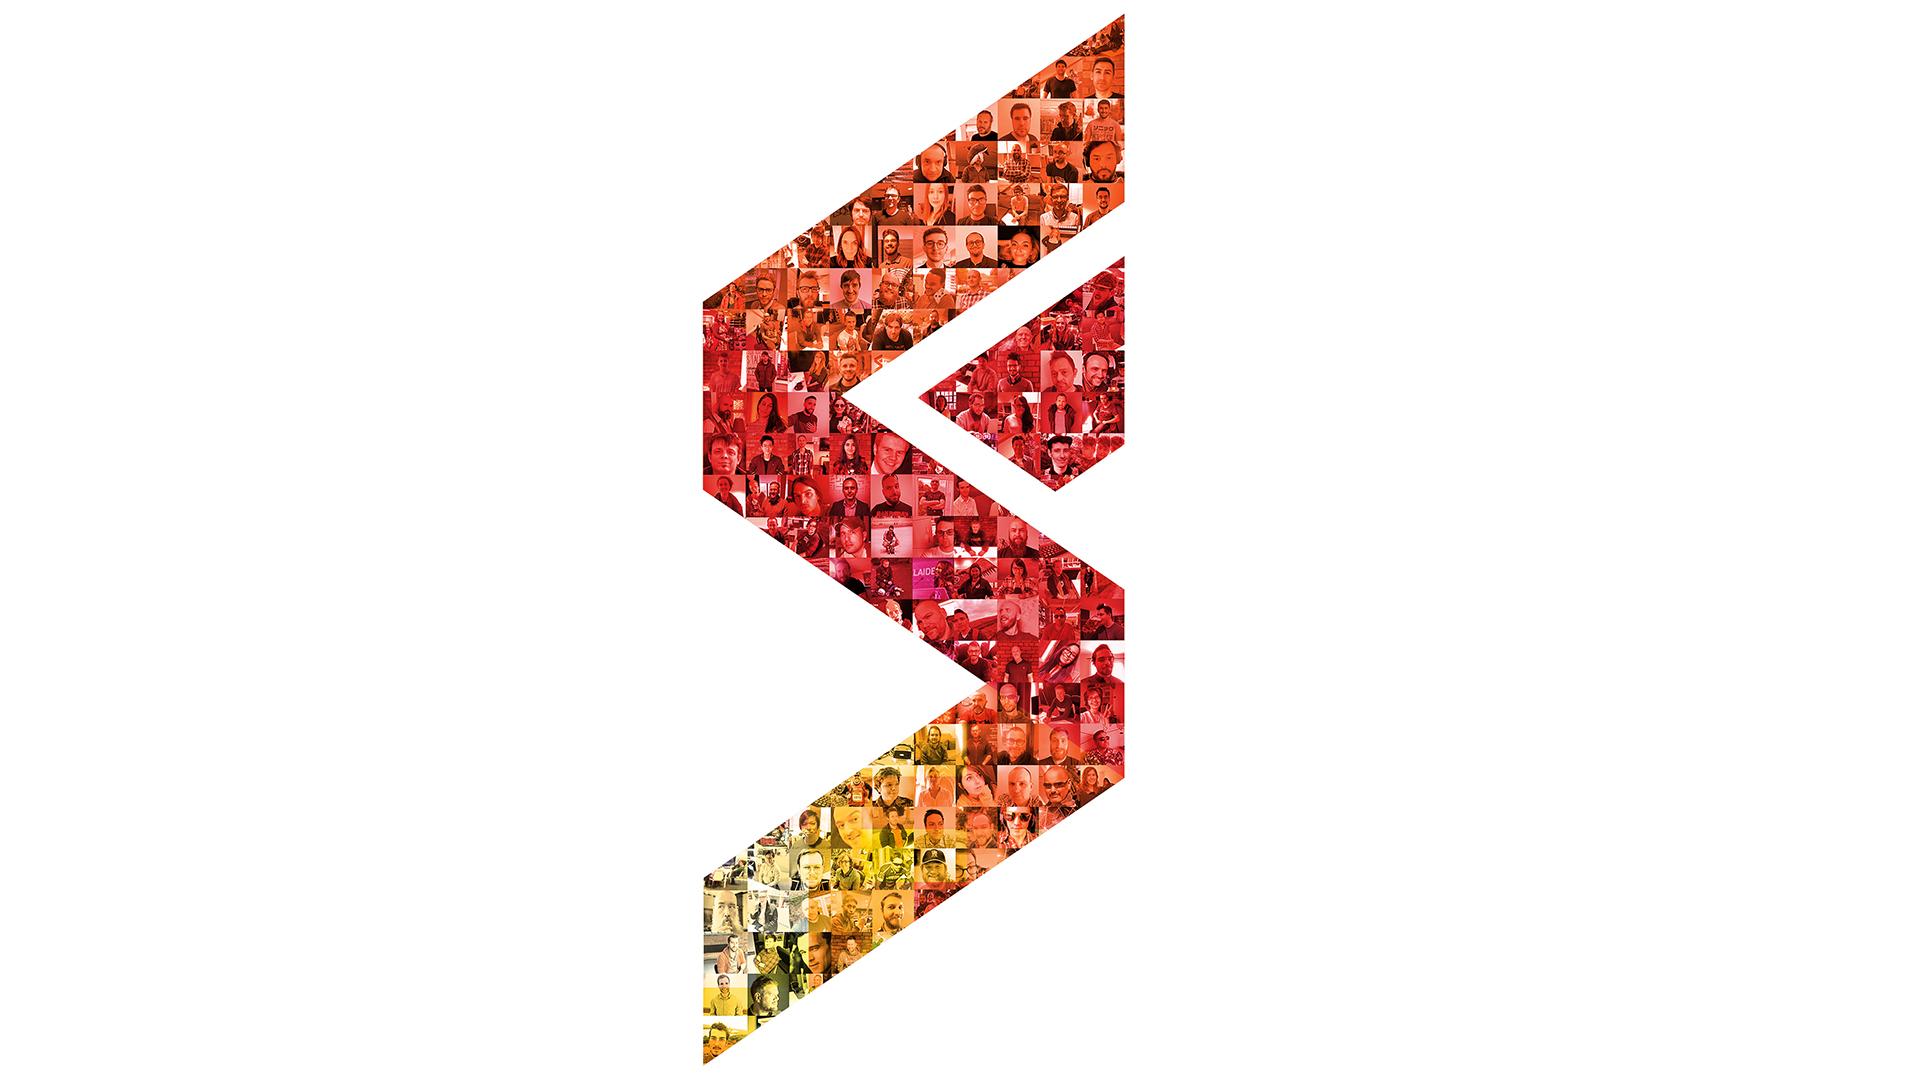 fireprite logo mosaic